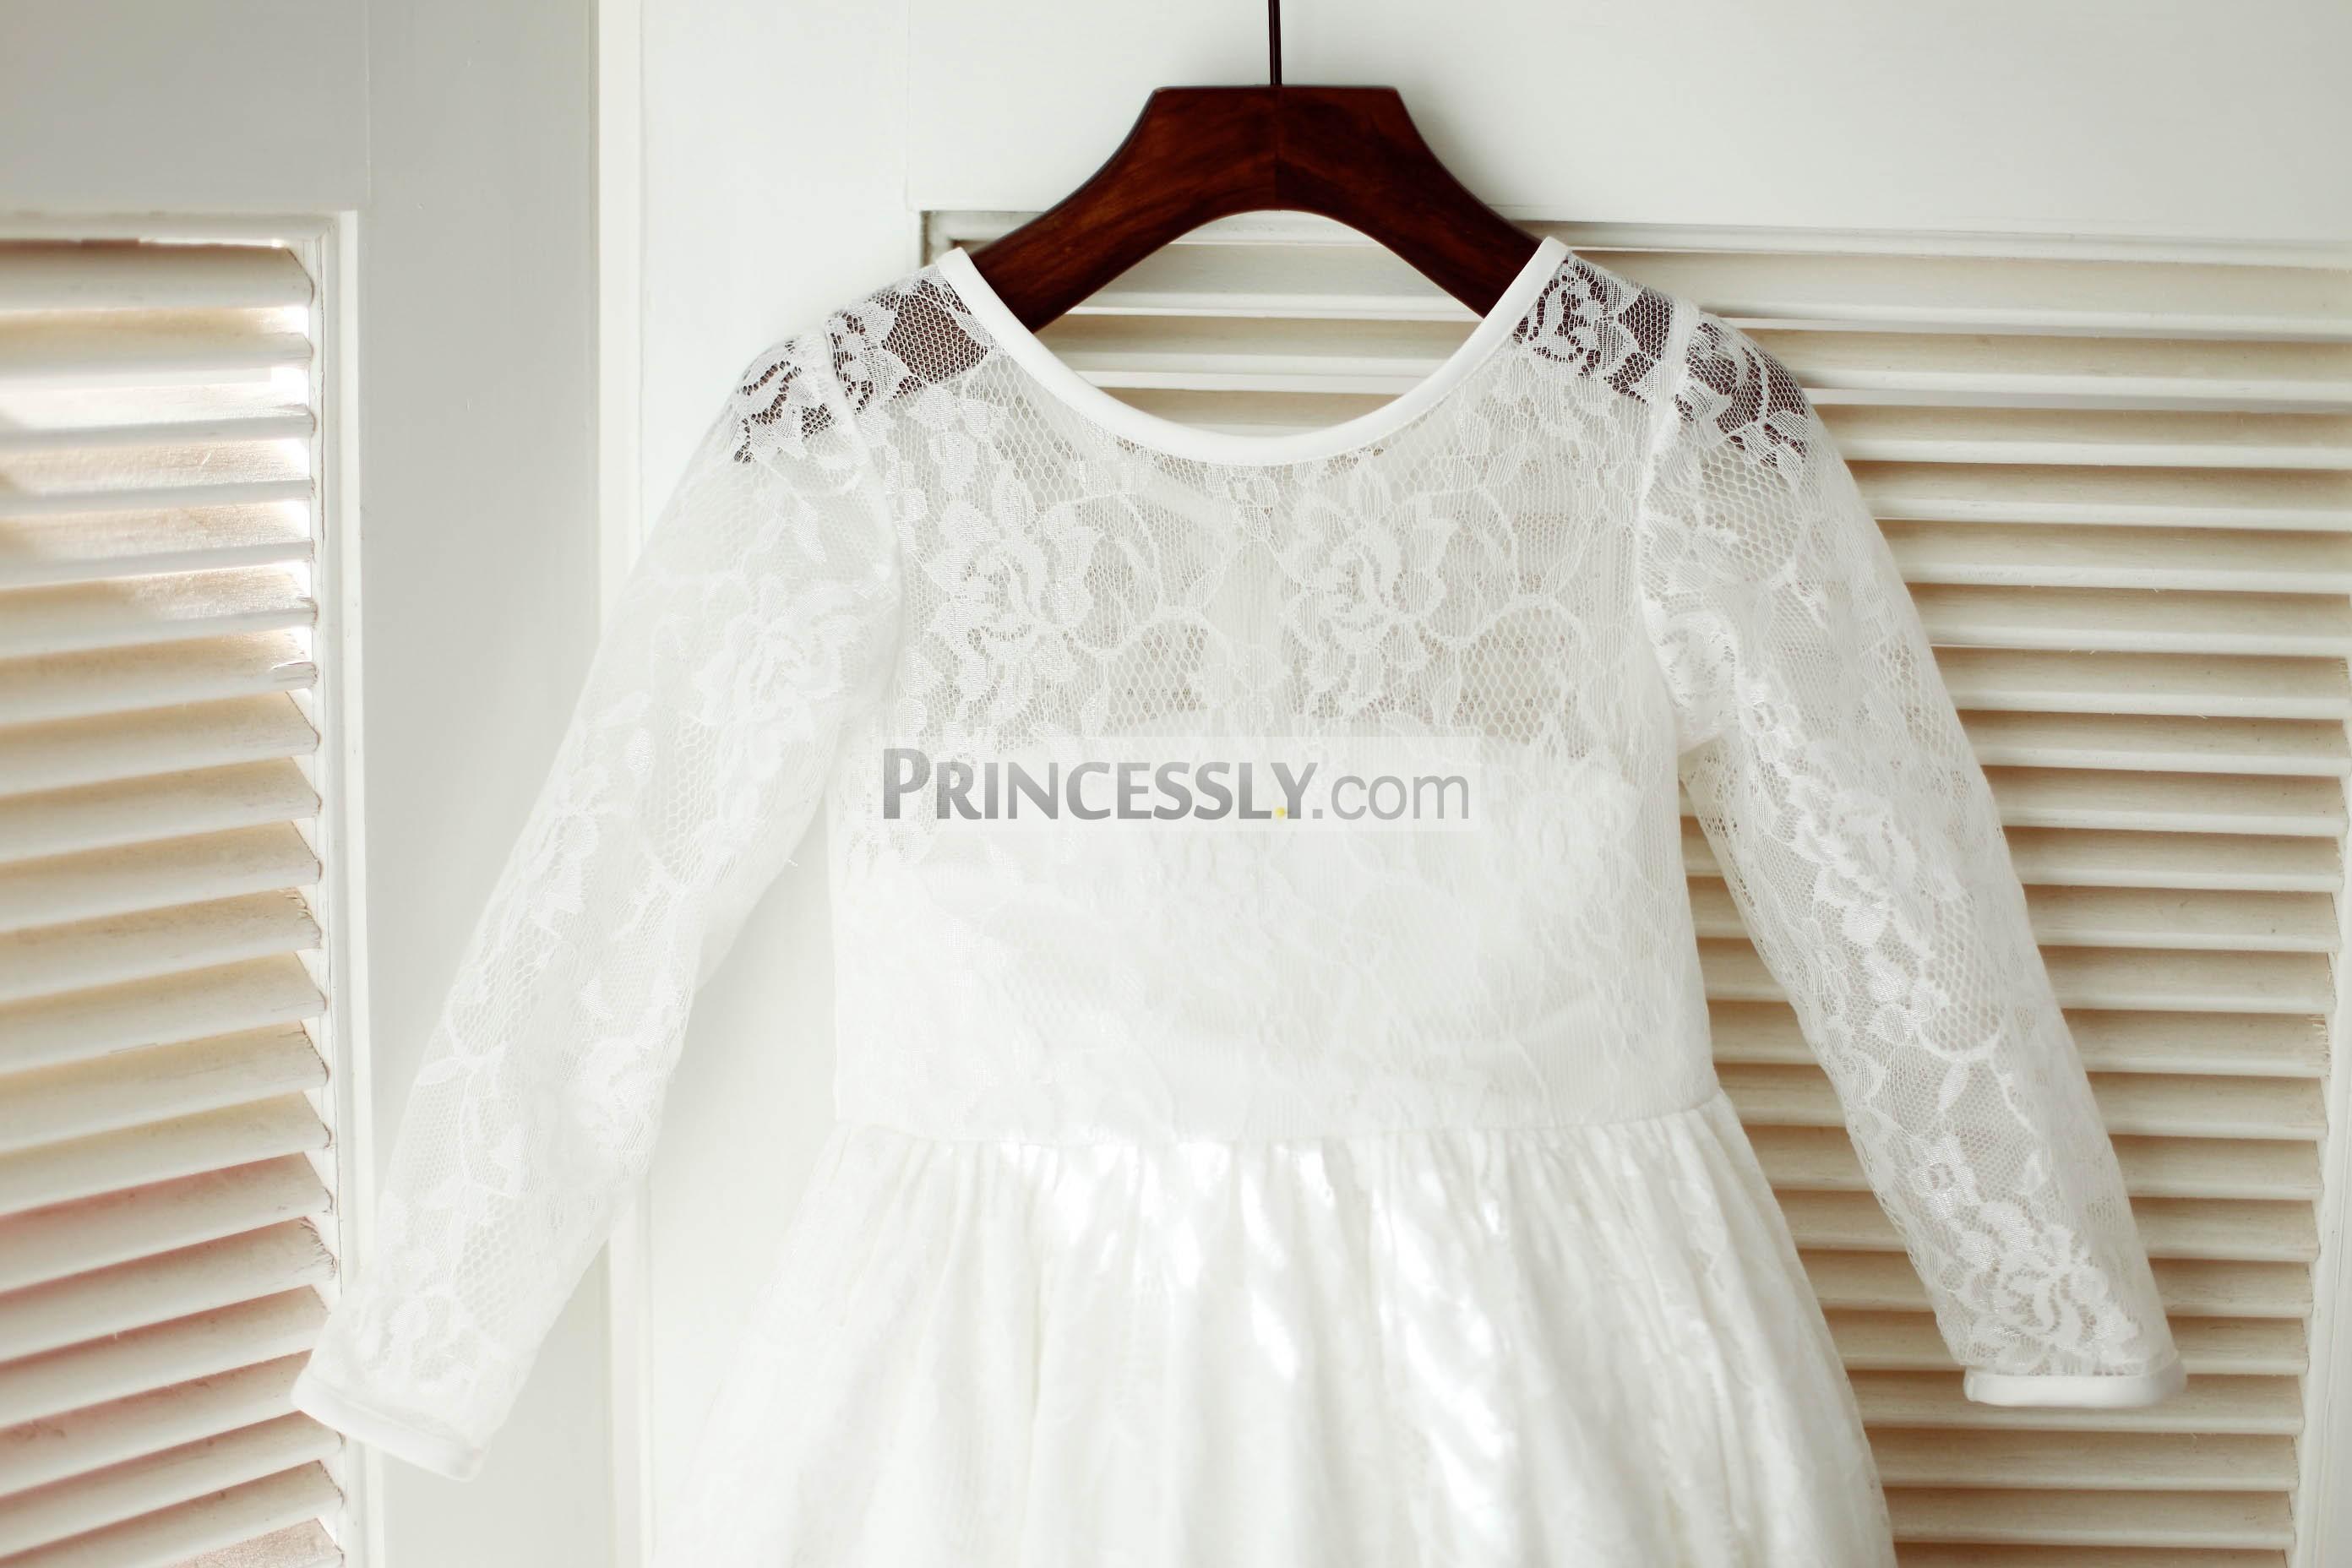 Ivory Lace Long Sleeves Flower Girl Dress with Flounce Hem